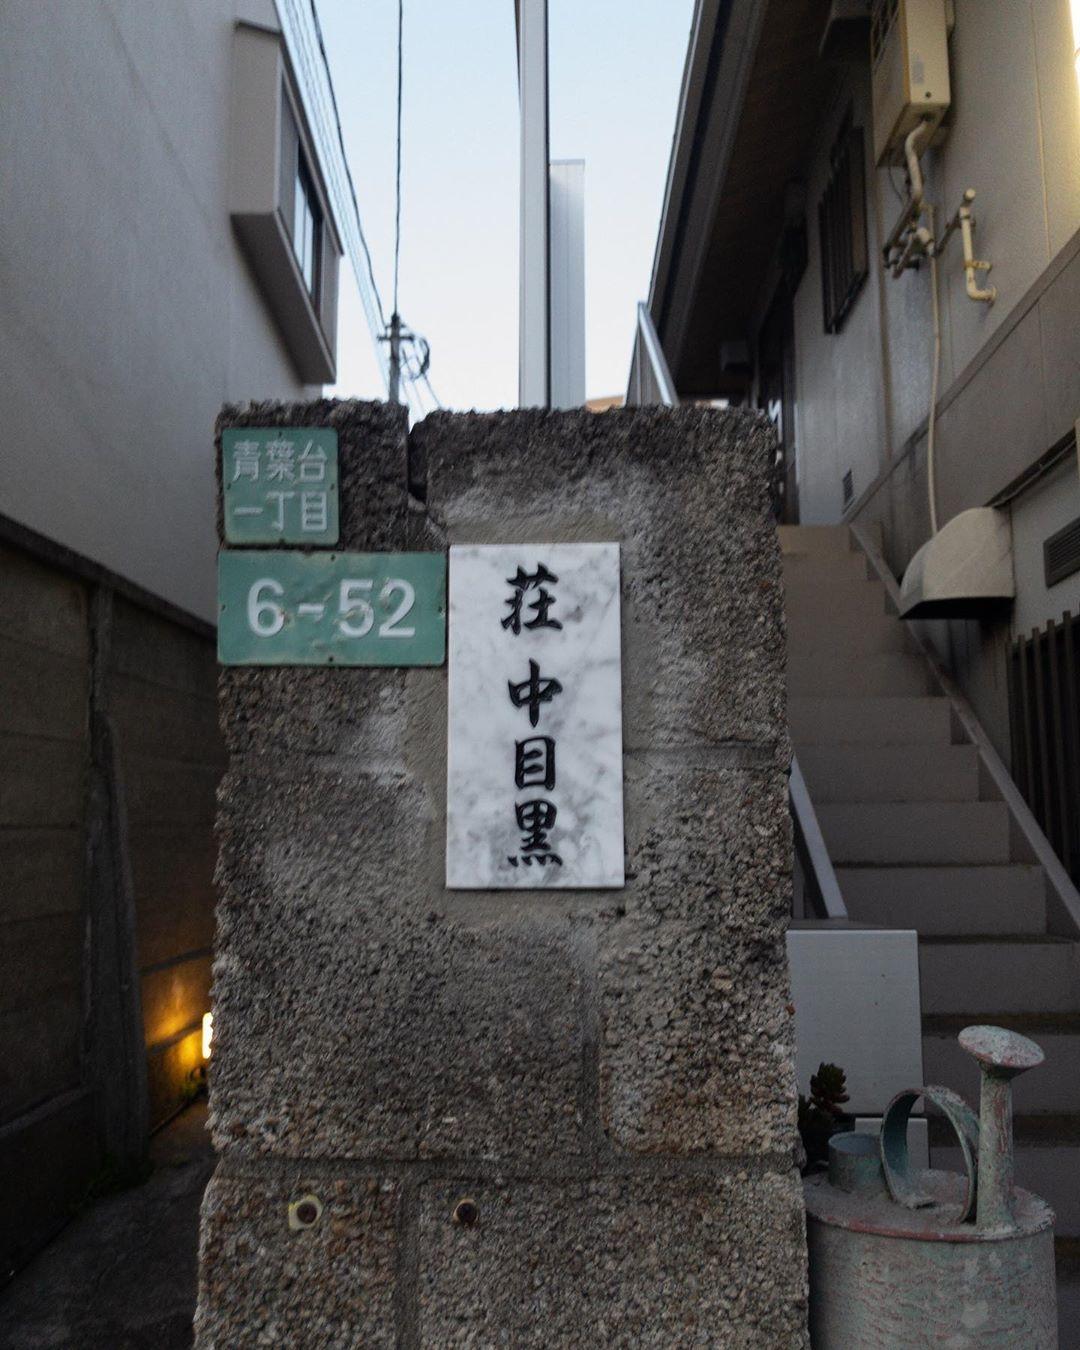 SO SHOP & HOSTEL NAKAMEGURO